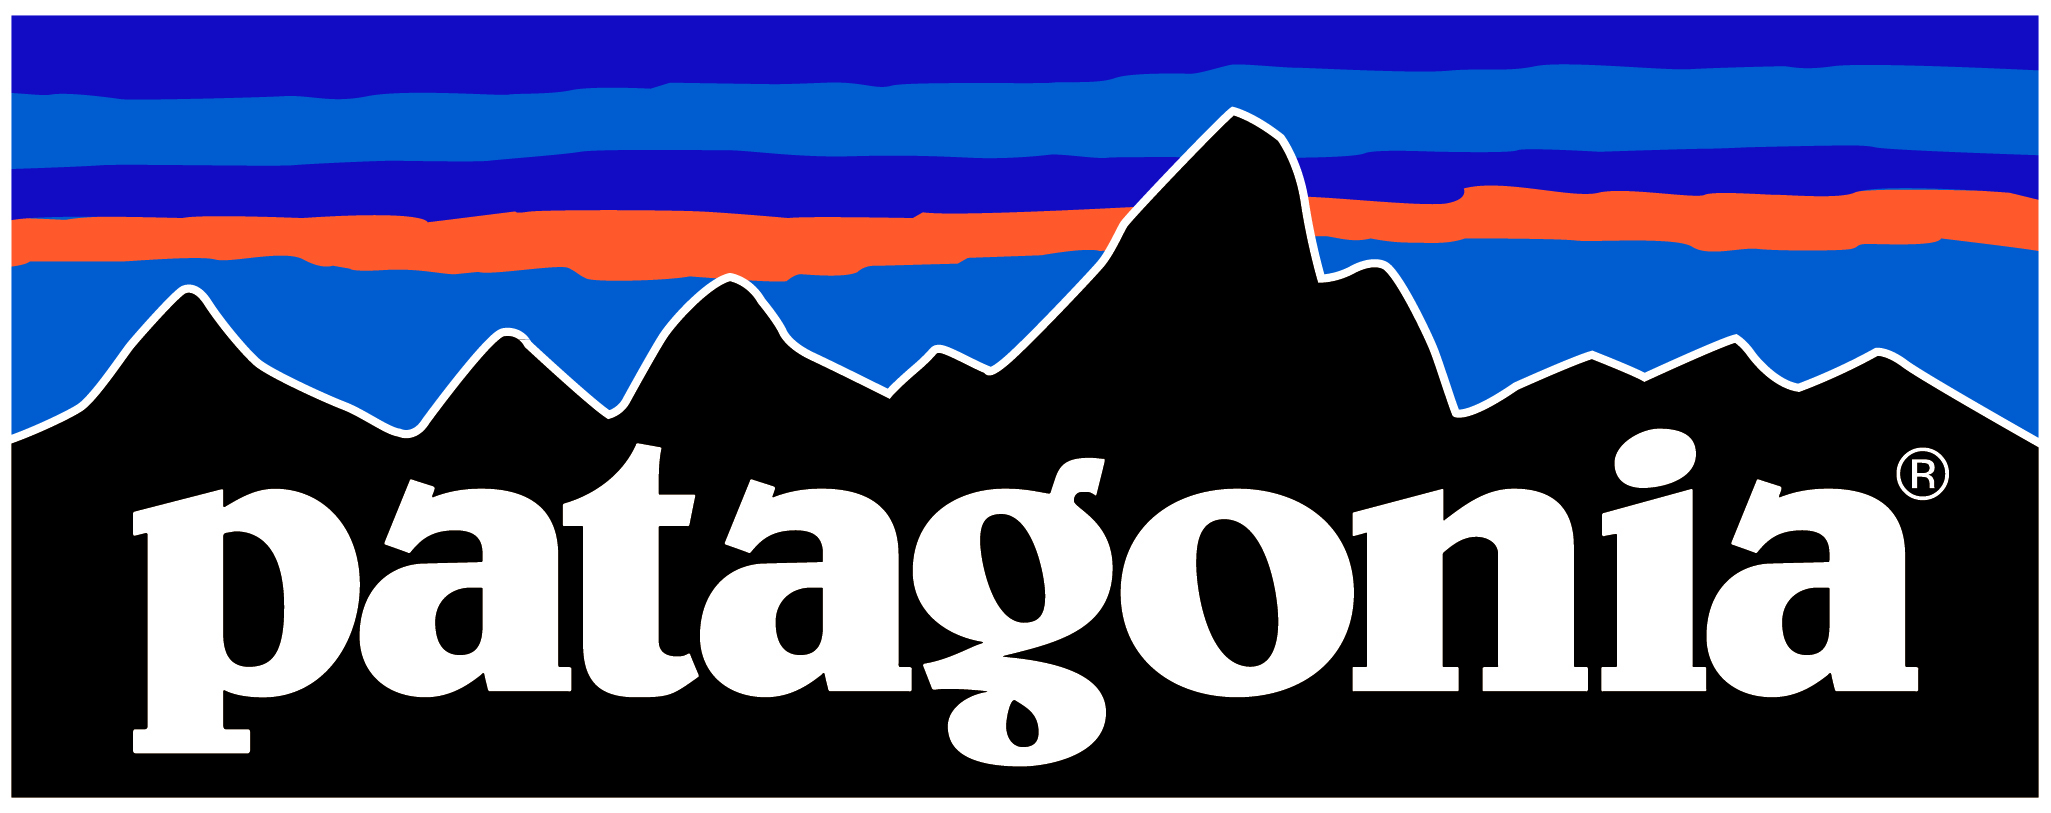 Patagonia nagrodzona w Davos